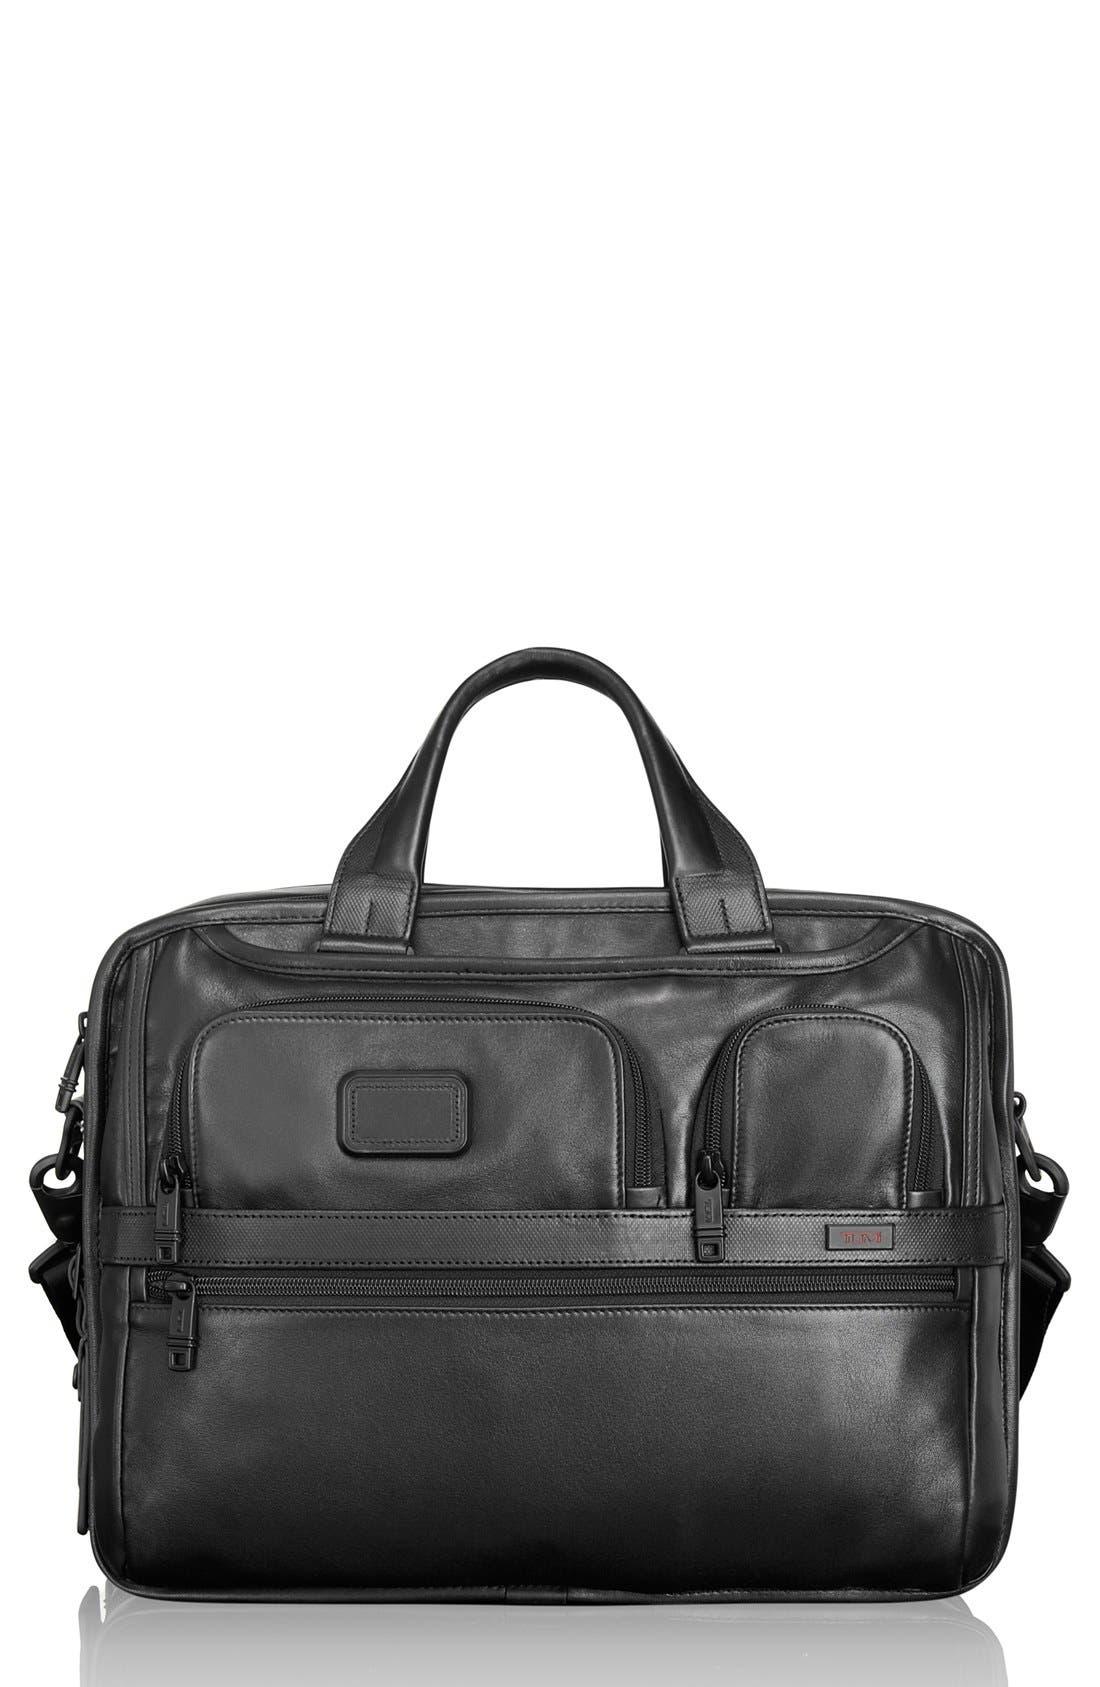 Alternate Image 1 Selected - Tumi 'Alpha 2' Expandable Laptop Briefcase